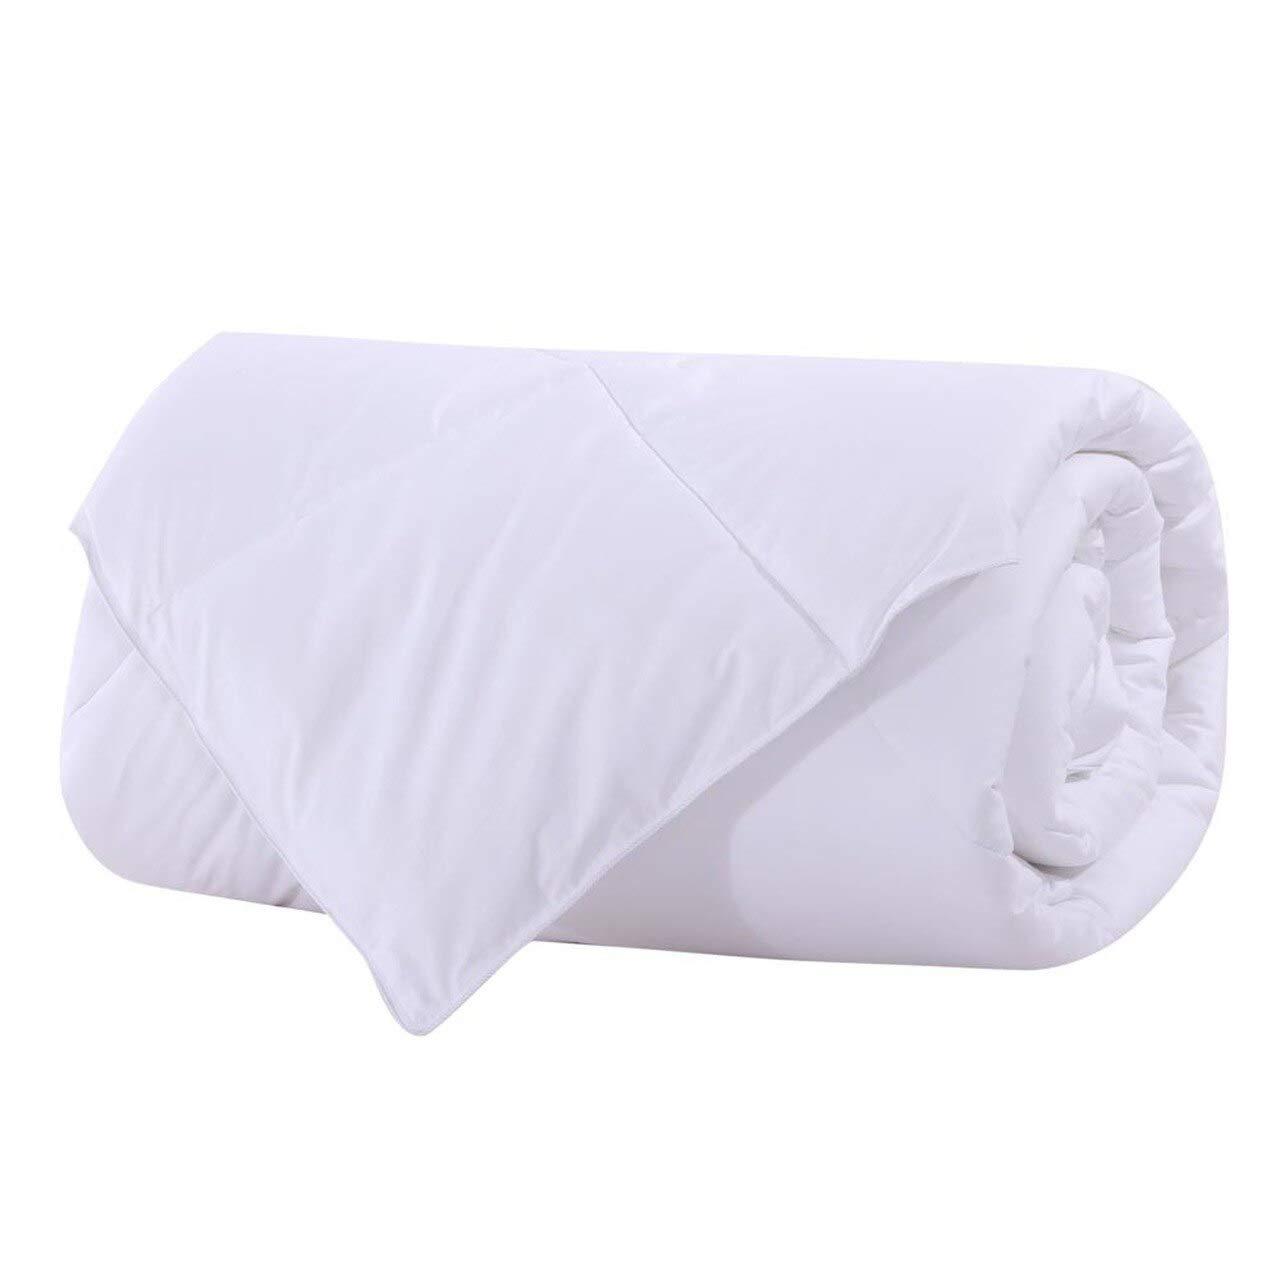 Royal Bedding Abripedic Bamboo Fiber Filled Blanket, Down Alternative Duvet Insert, 100% Cotton Shell, Breathable, Hypoallergenic, King/California-King Size, White